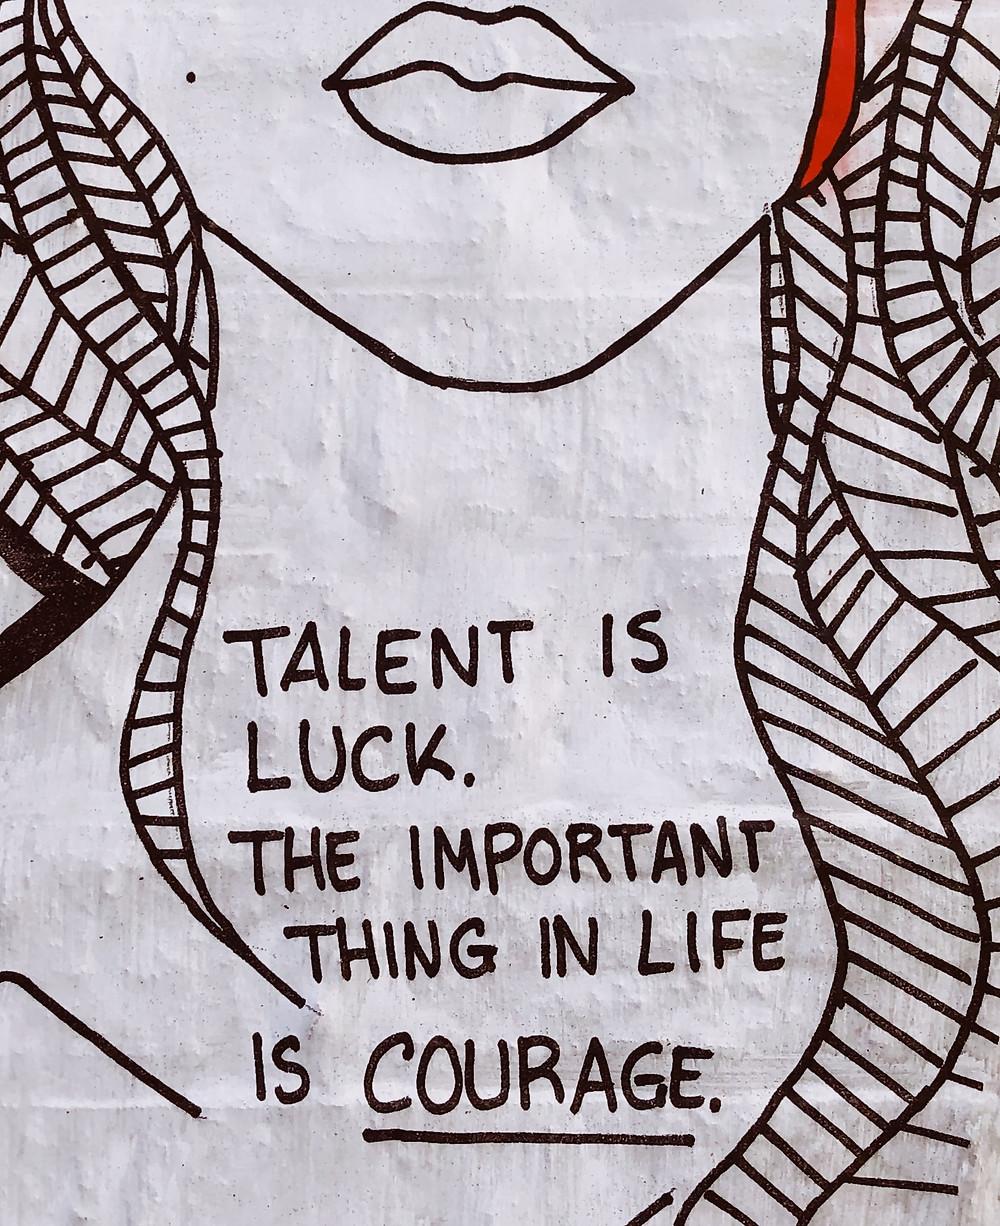 Talent is luck artwork